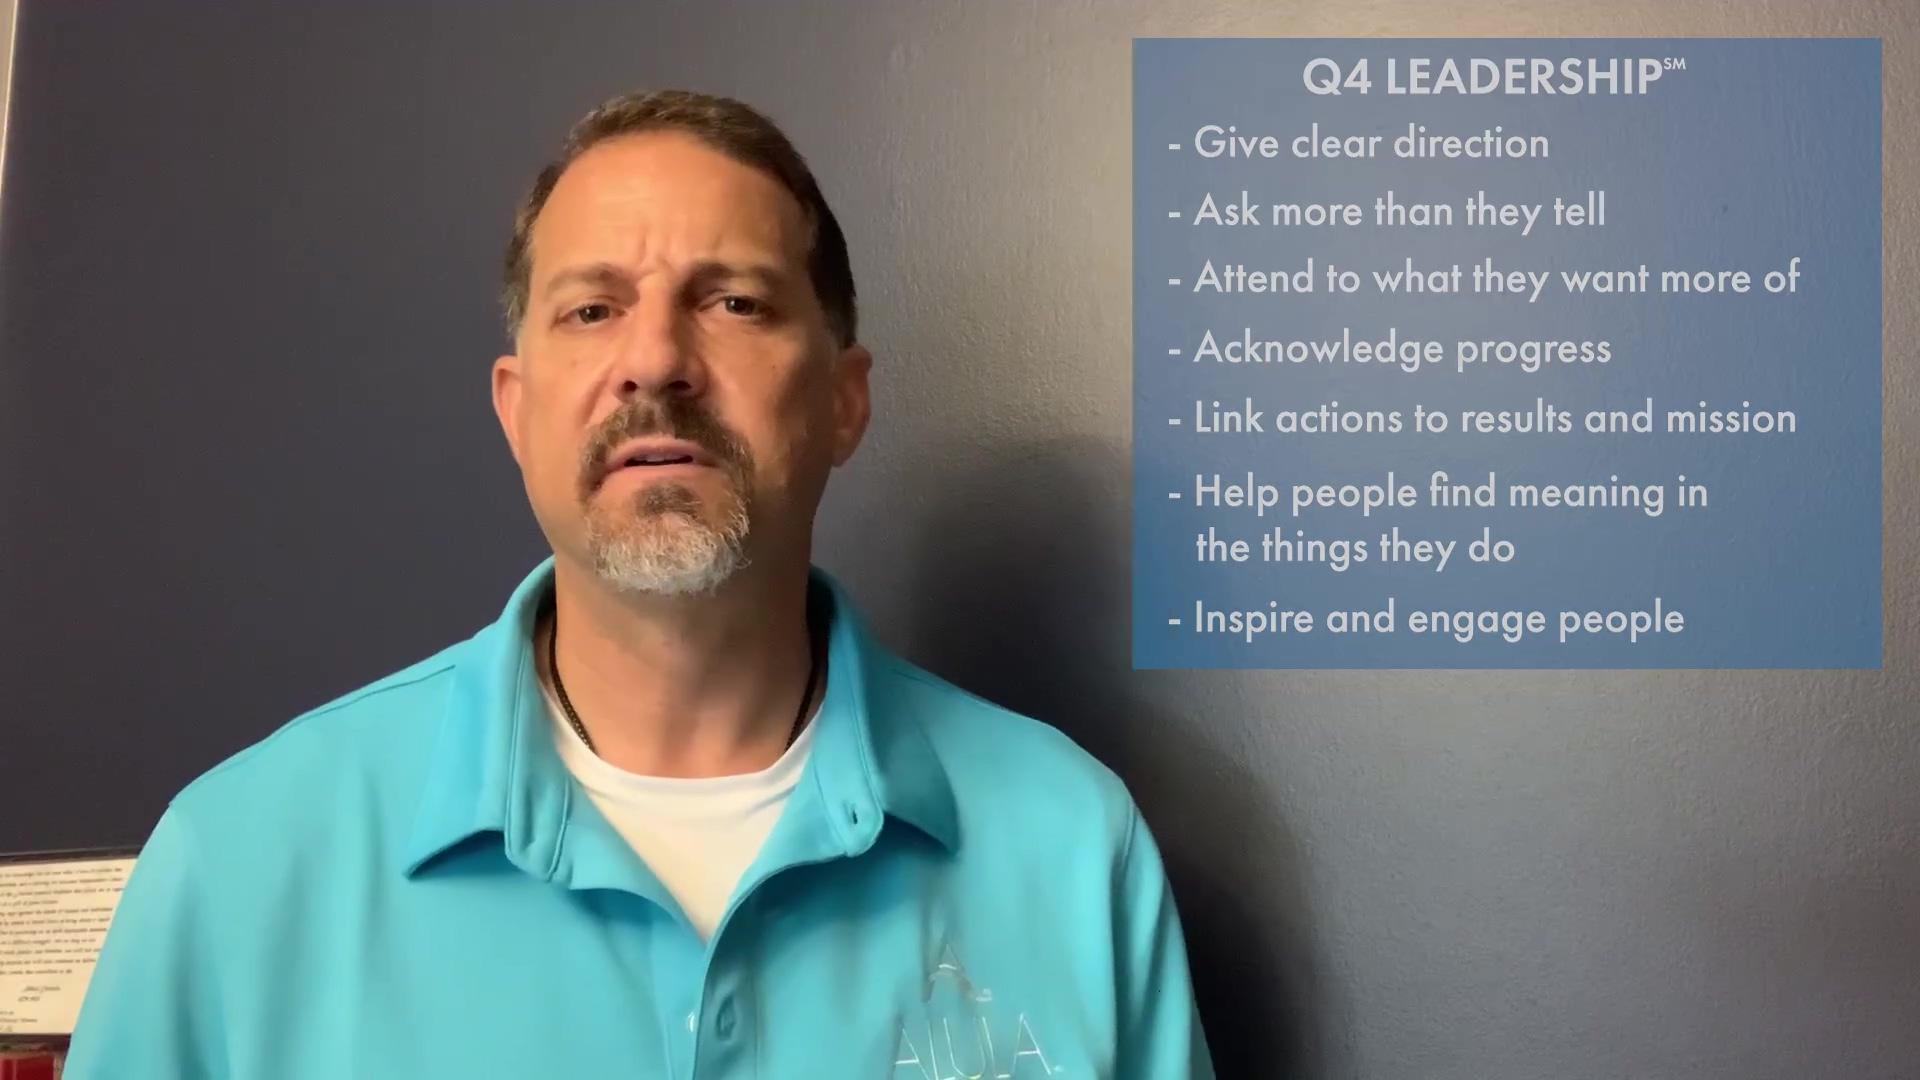 ALULA_KWagner_Q4_Leadership